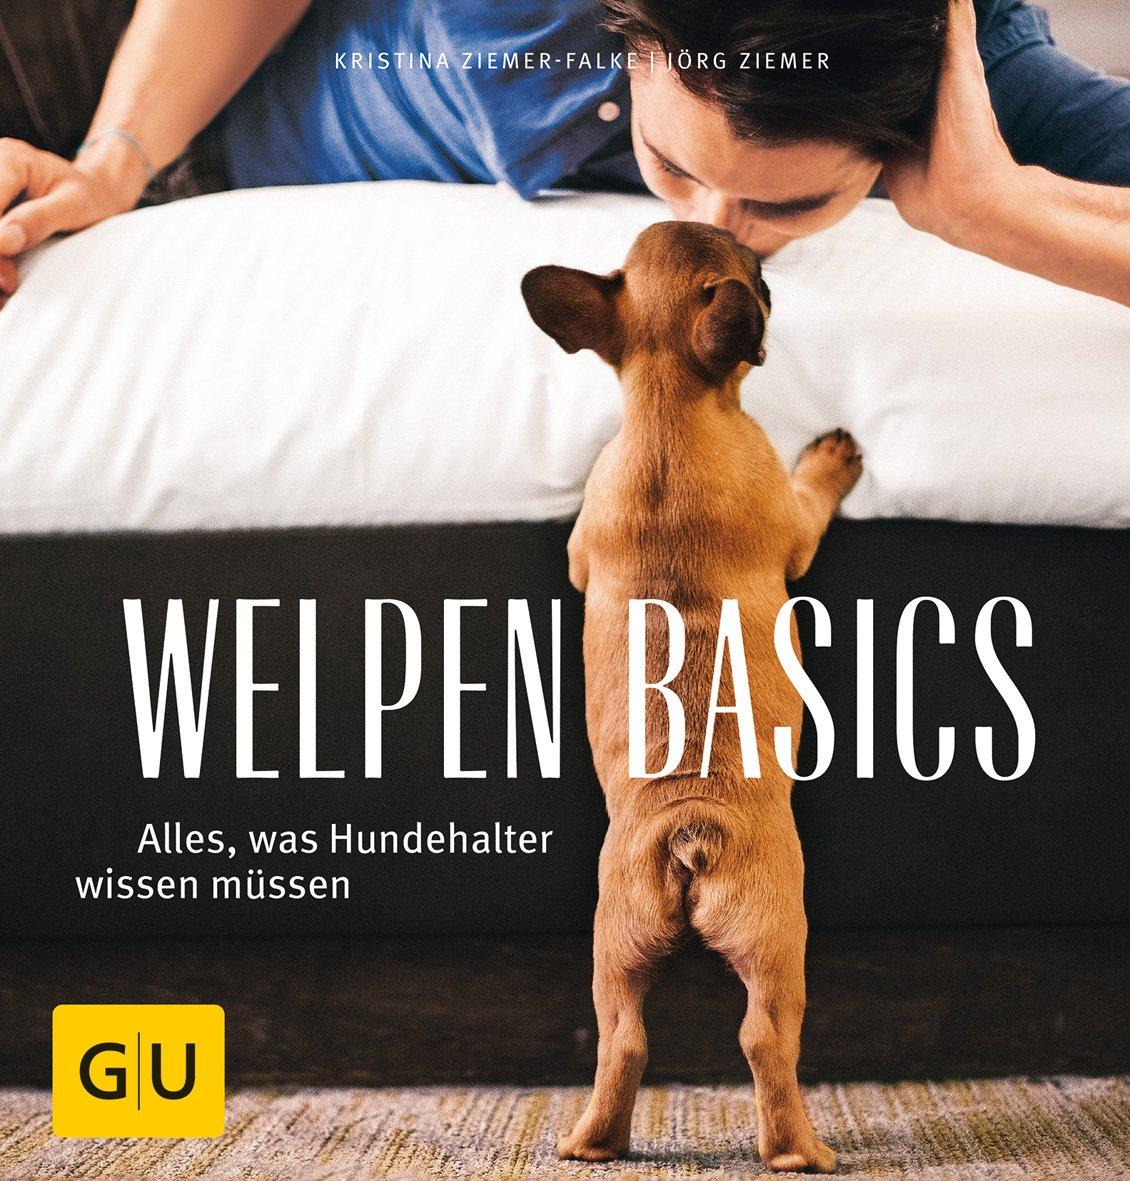 Welpen-Basics: Alles, was Hundehalter wissen müsssen (GU Tier Spezial)